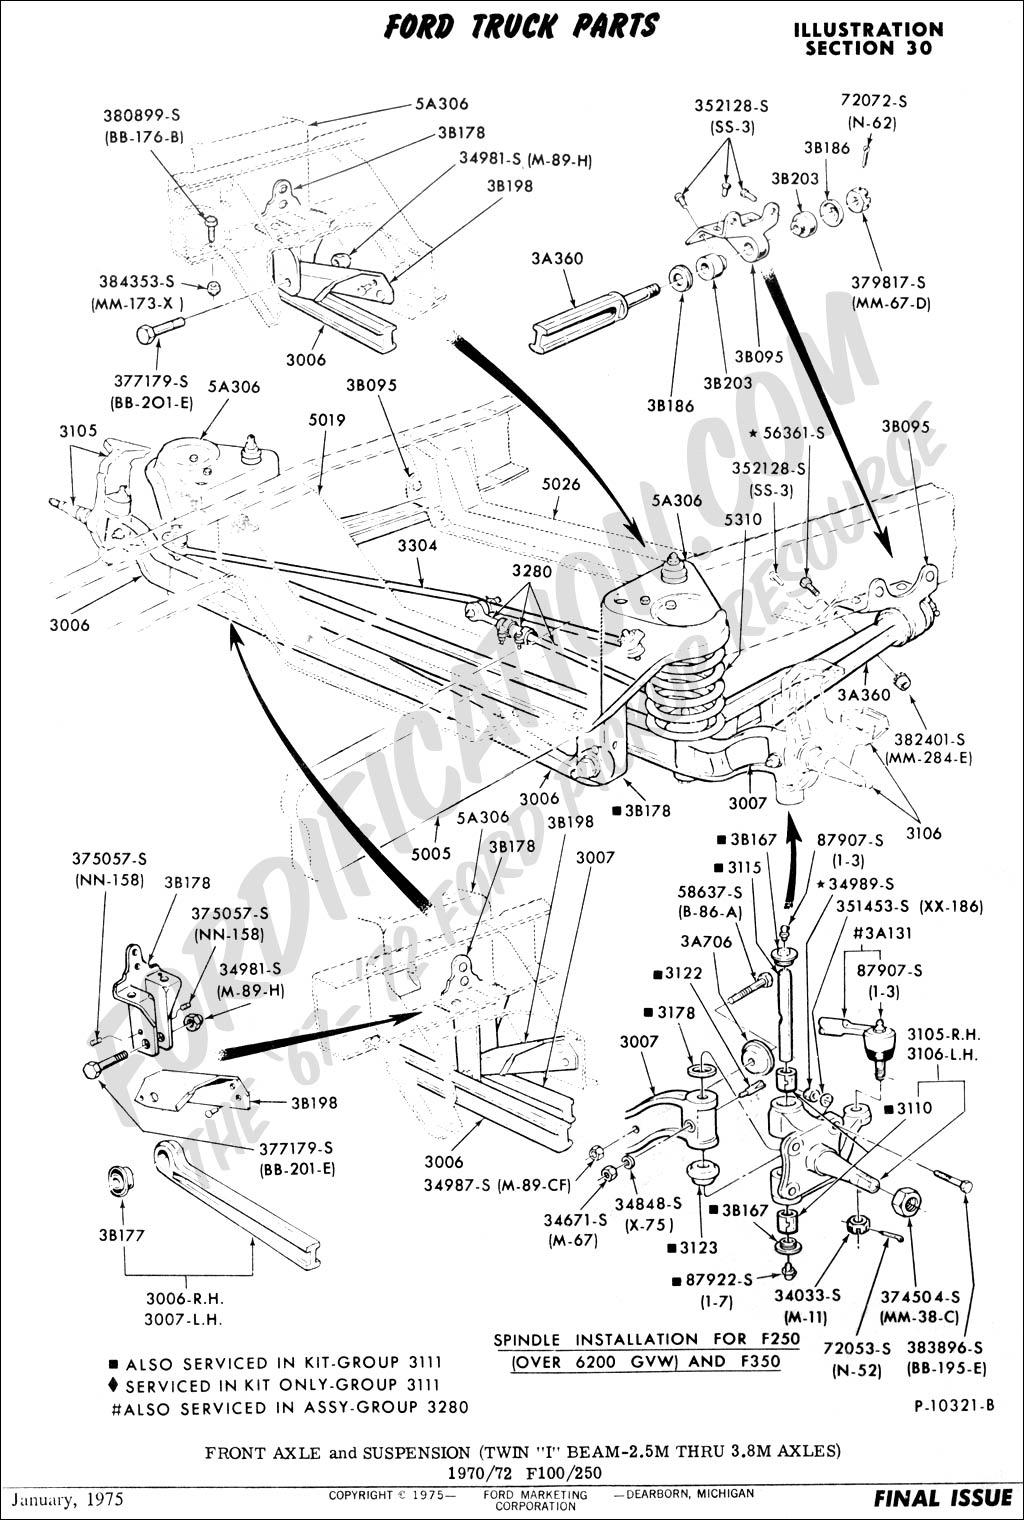 Dodge 97 Ram 4x4 Front Axle Diagram